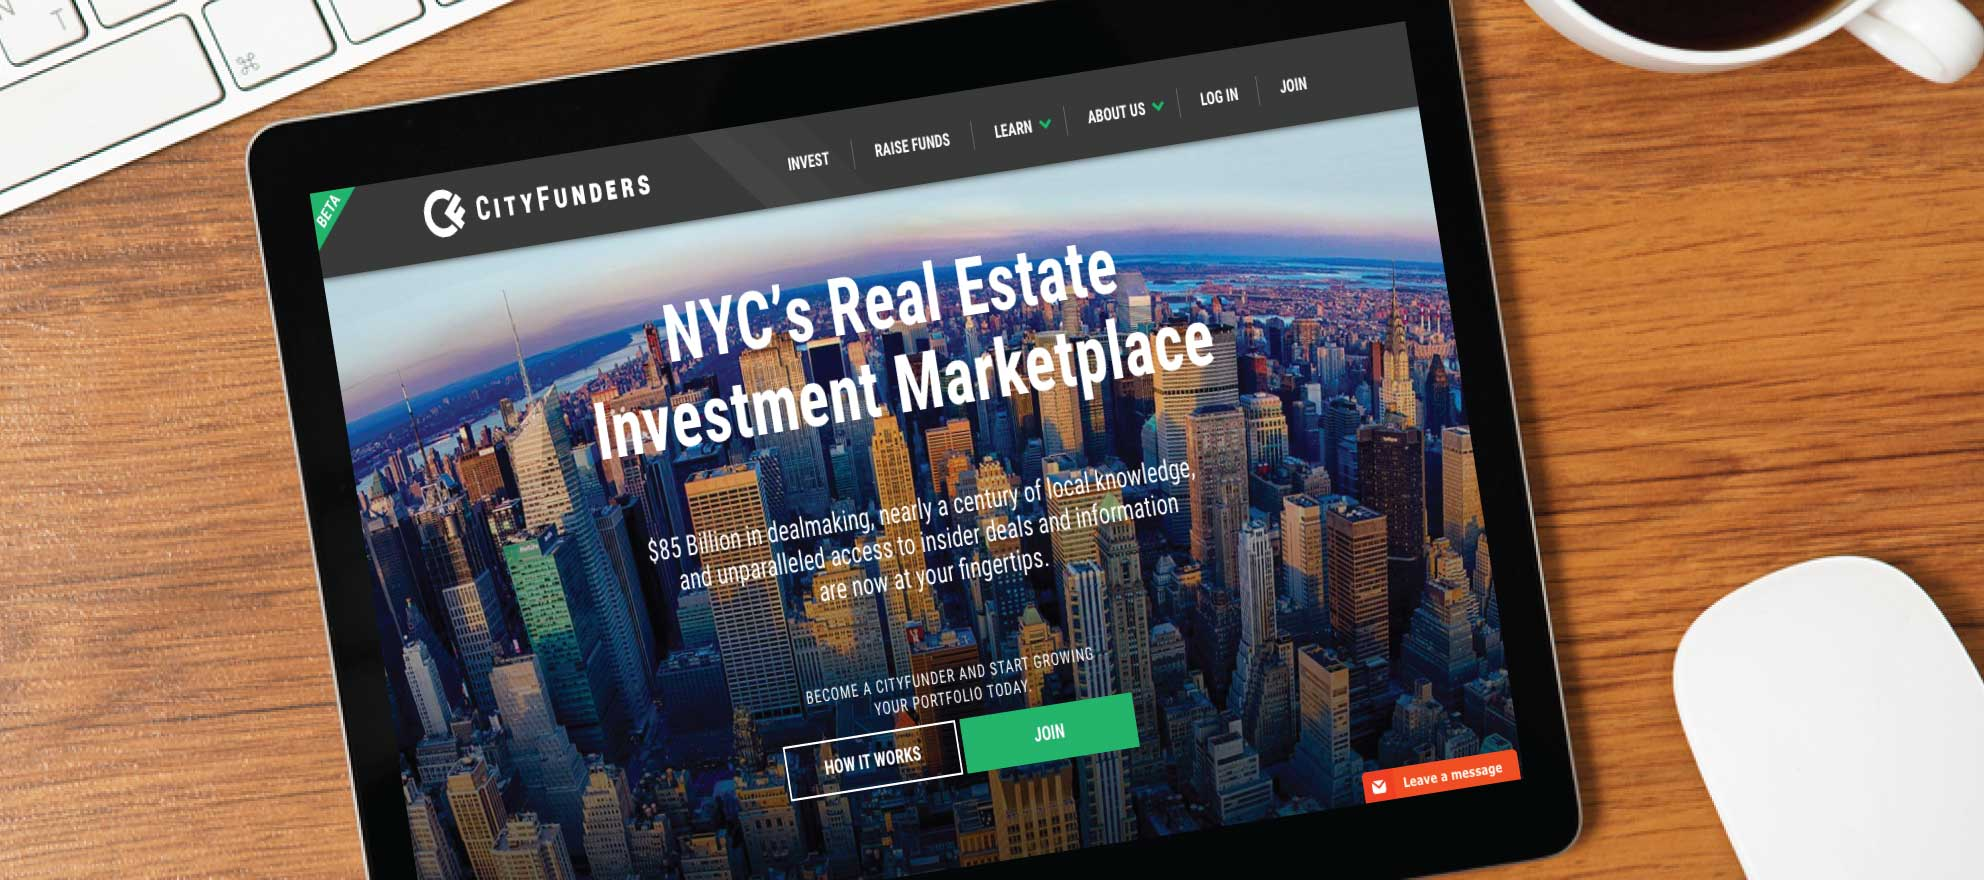 Crowdsourcing platform for New York investors takes bite out of Big Apple's complex real estate deals